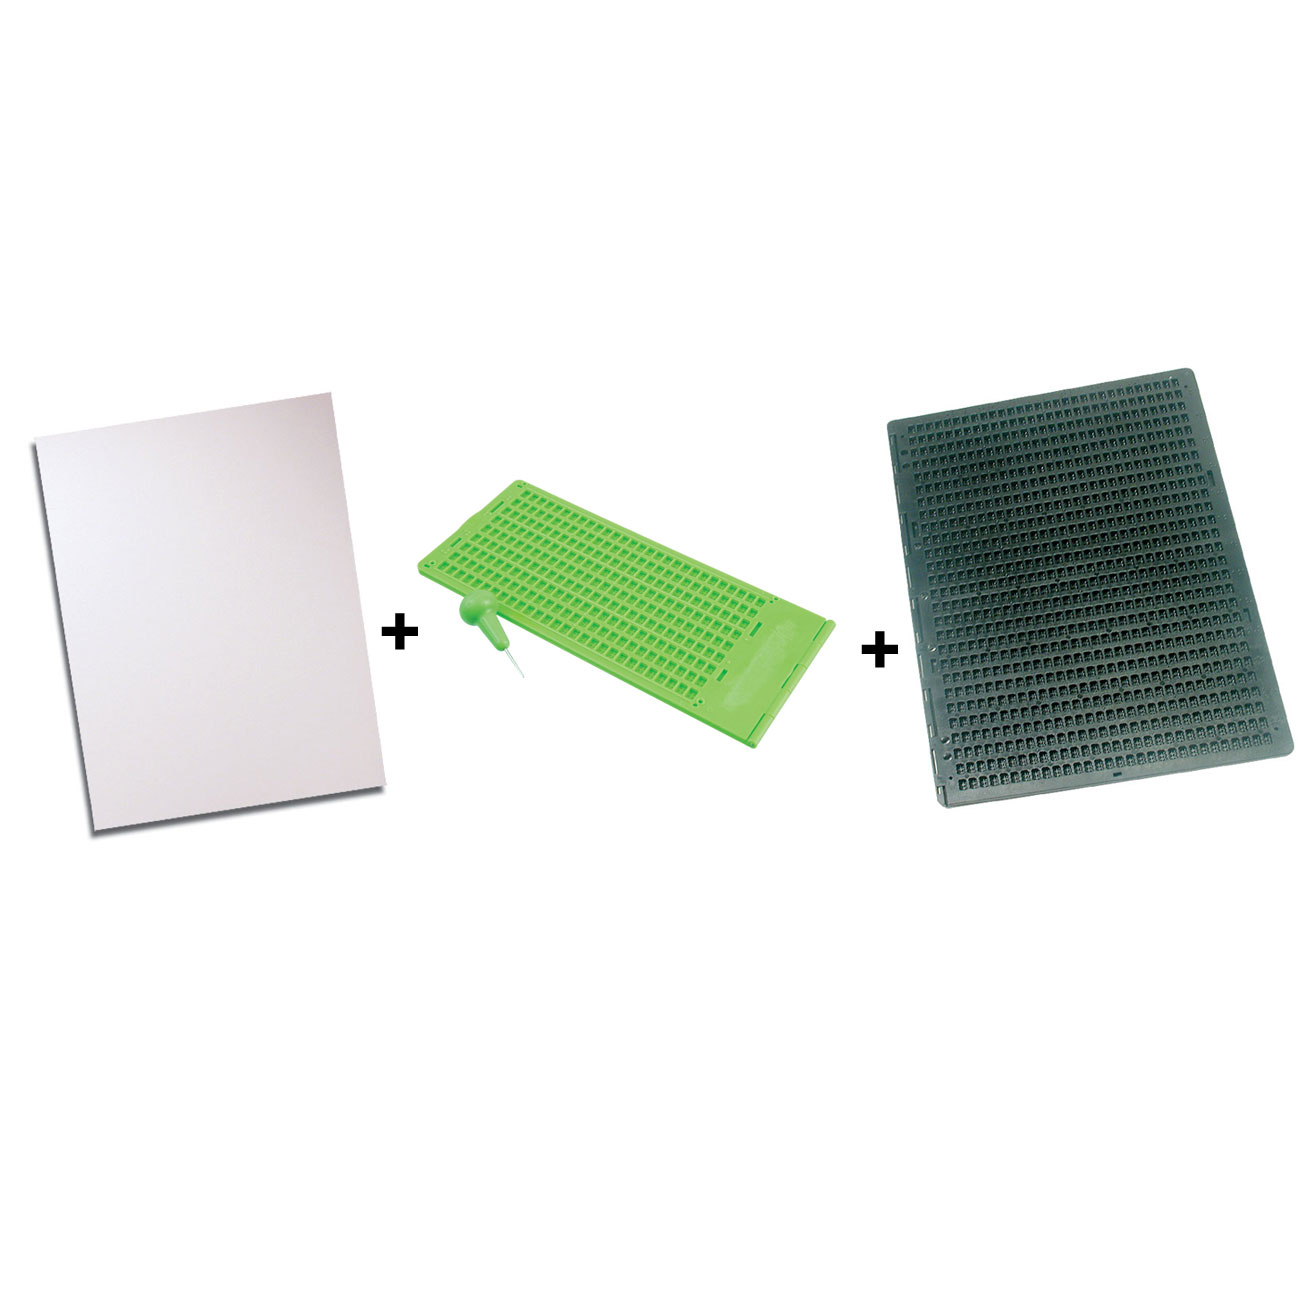 MaxiAids Braille Slates + Stylus + Paper Bundle